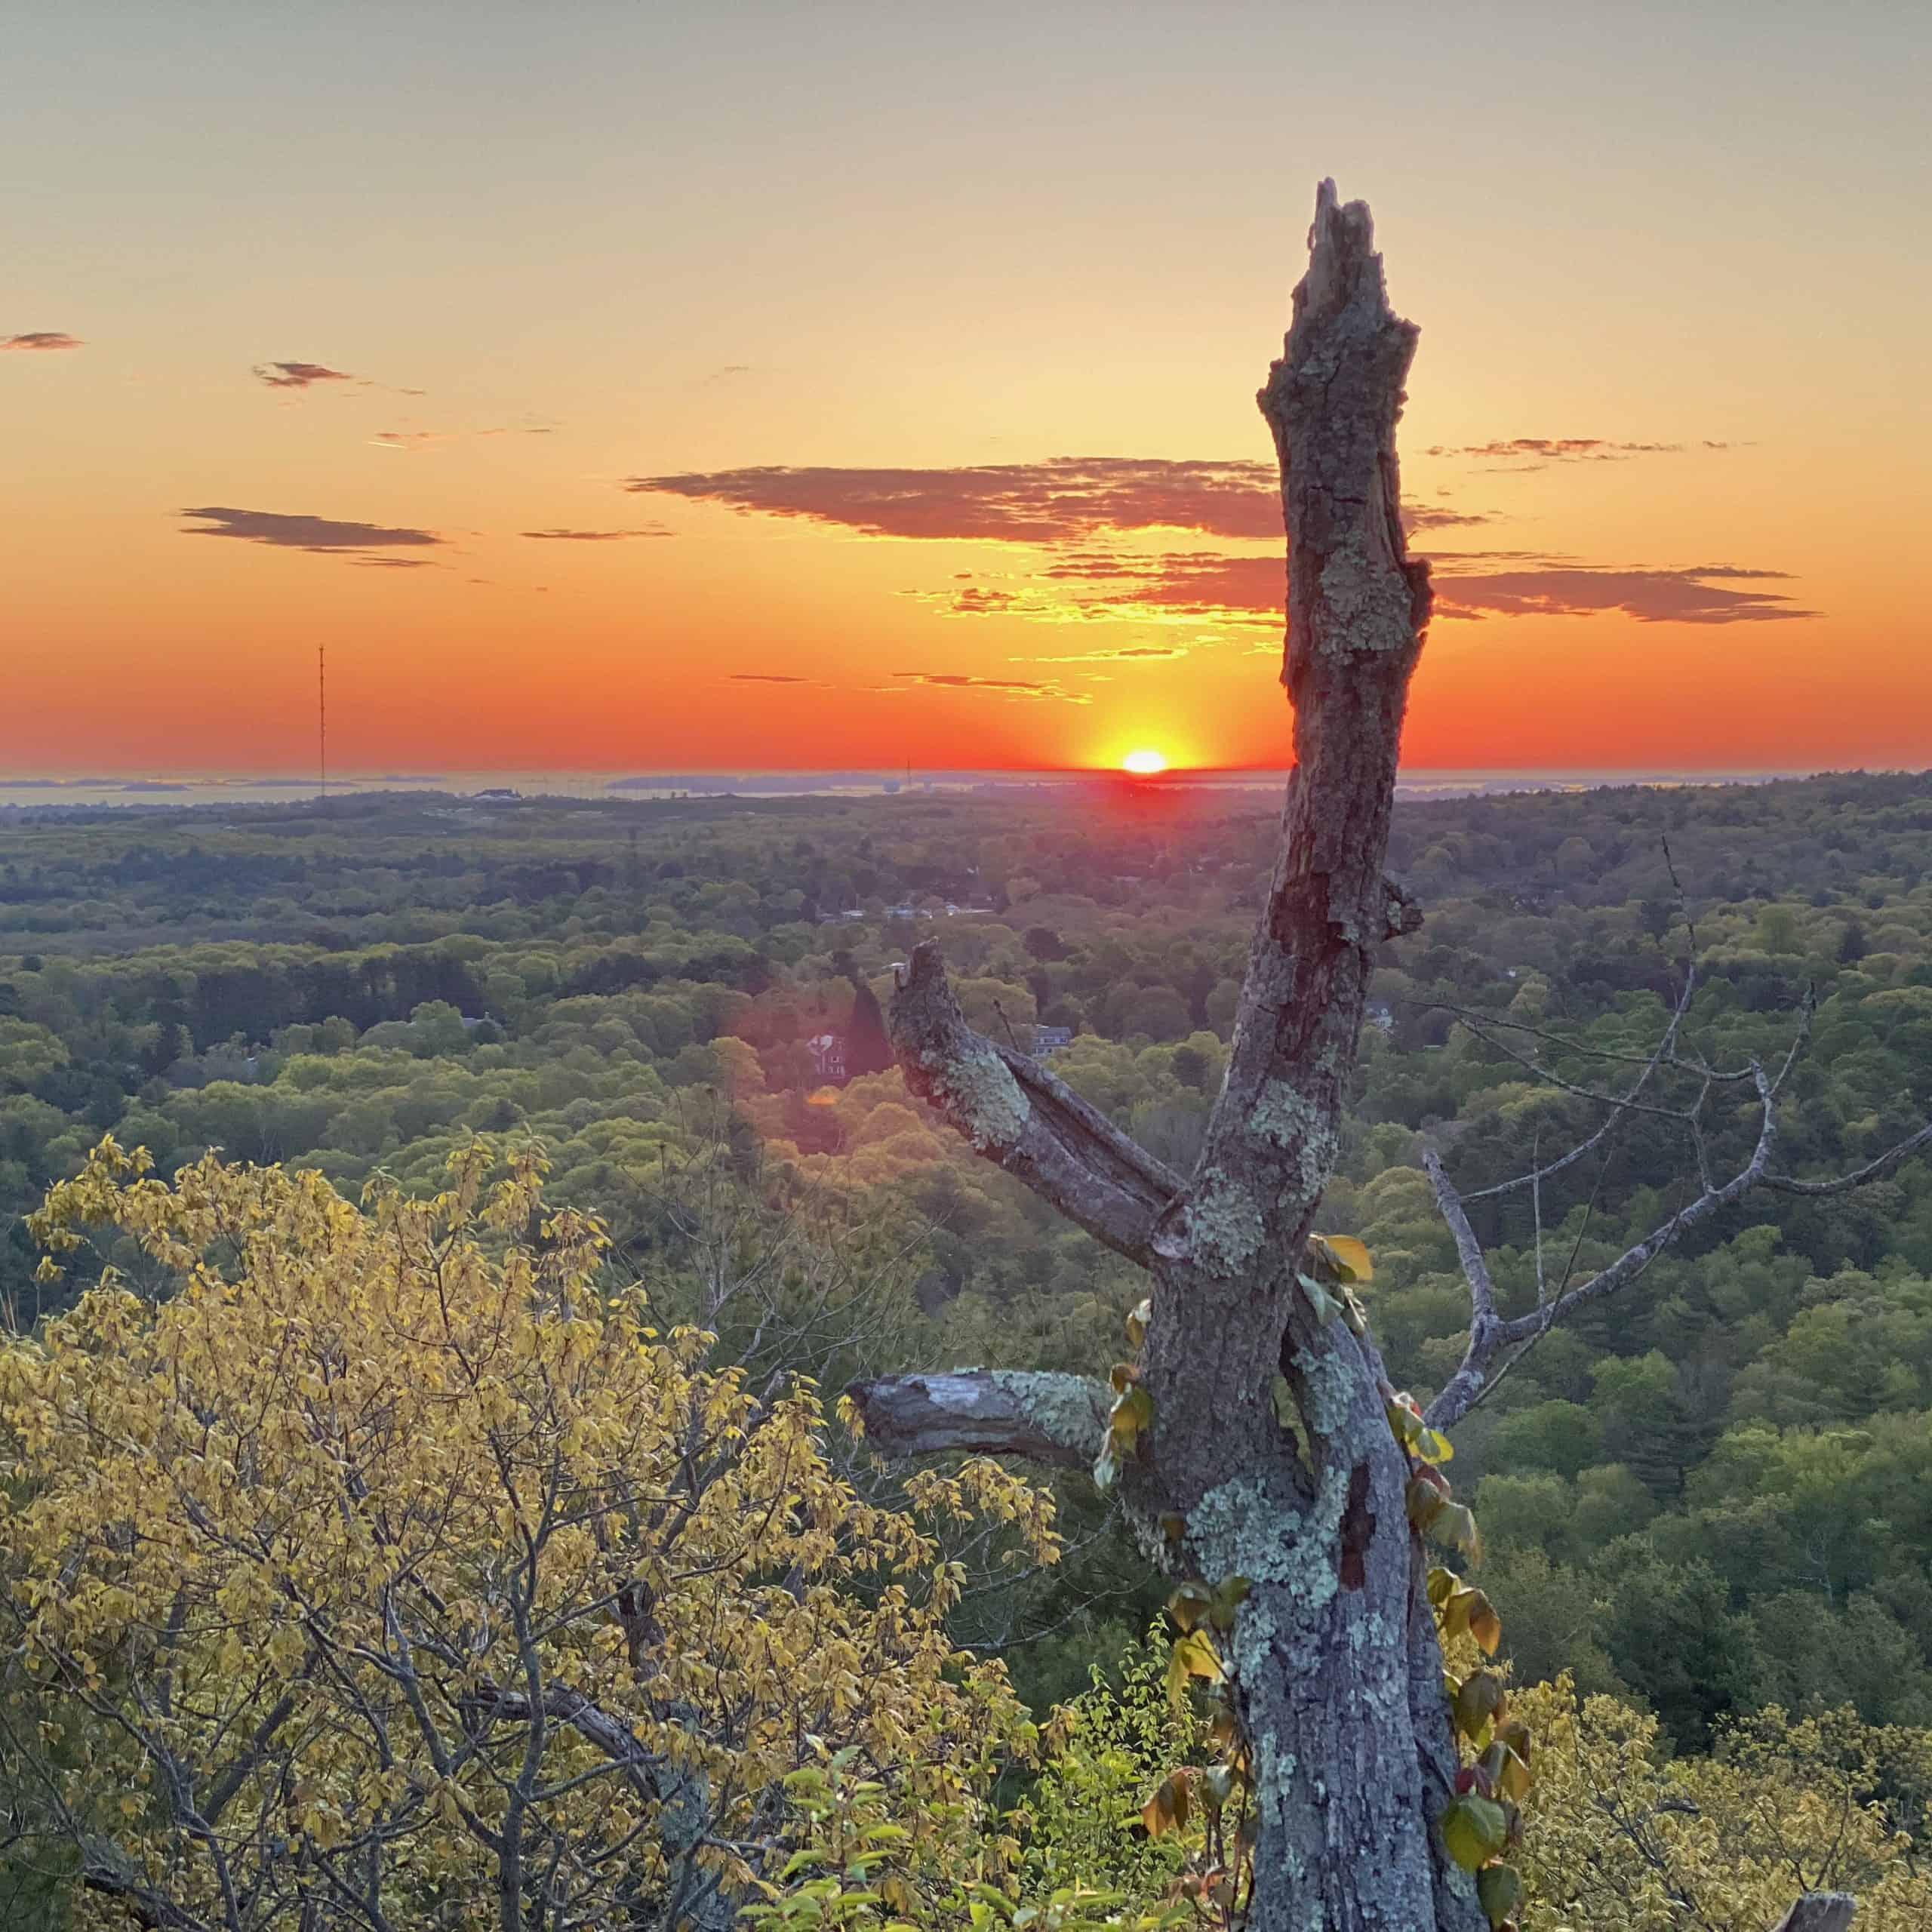 daybreak in the blue hills